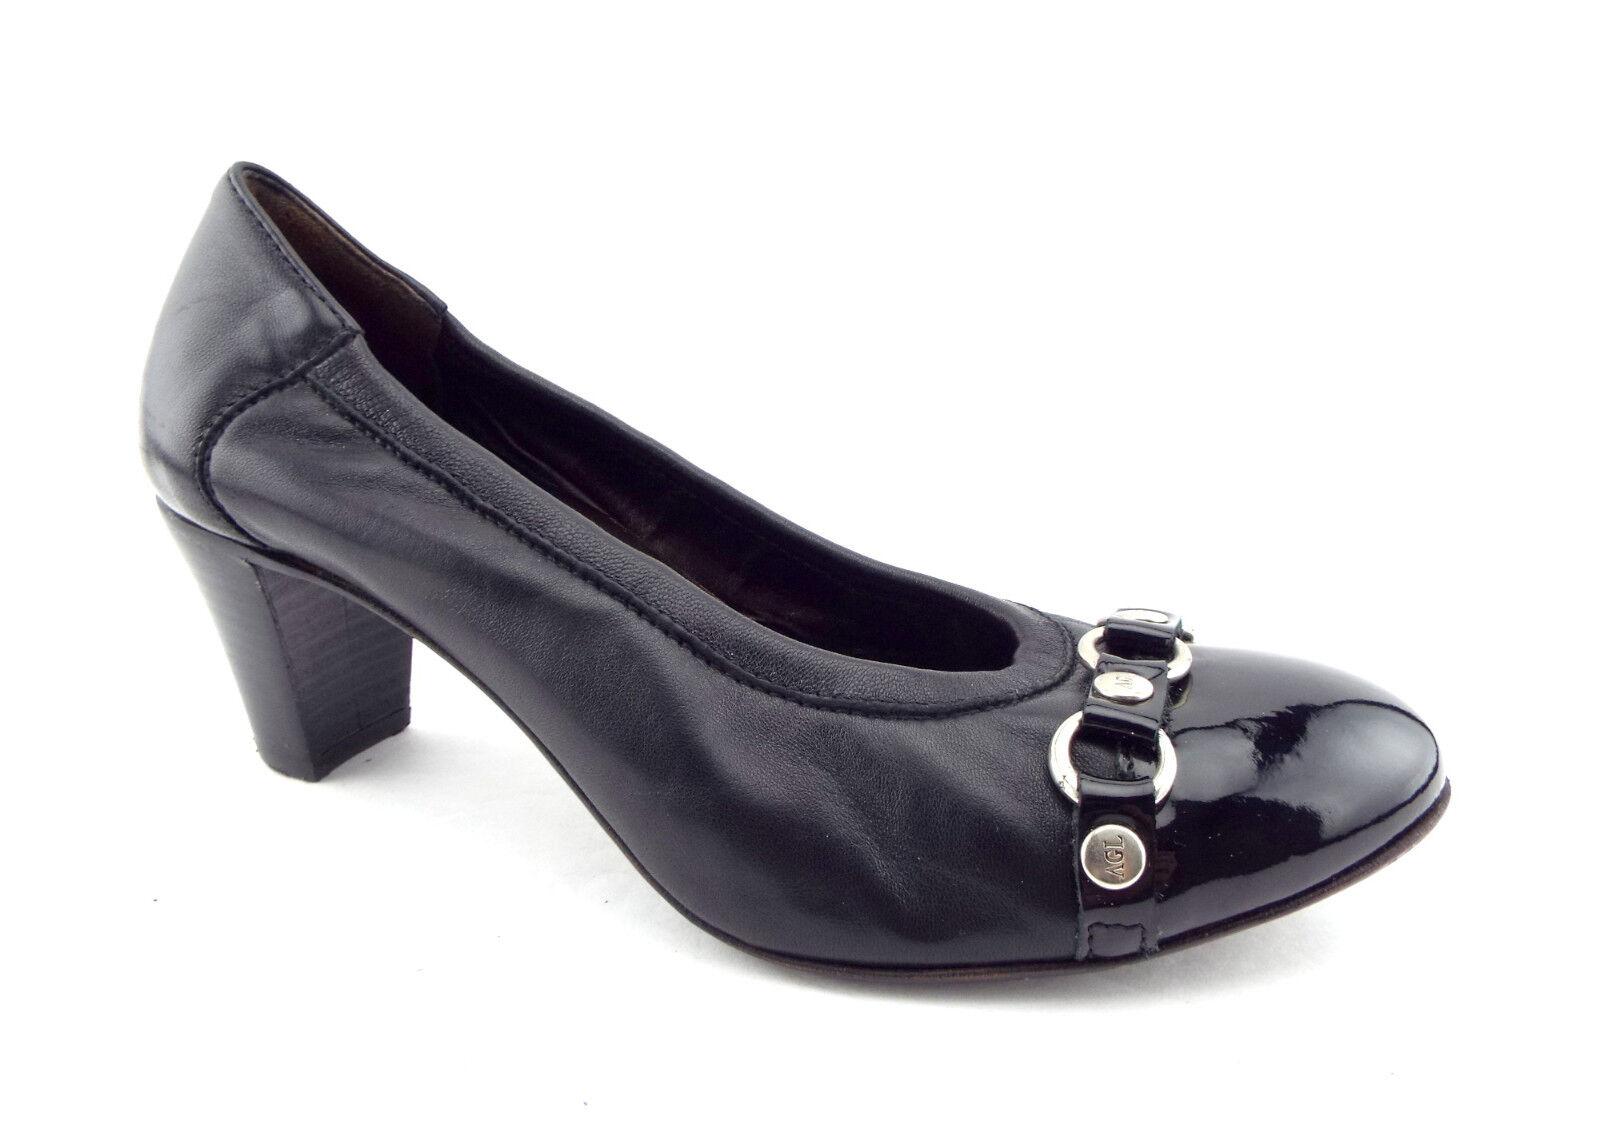 AGL ATTILIO GIUSTI LEOMBRUNI Size 7 Black Cap Toe Pumps Pumps Toe Heels Shoes 37 67c8e3